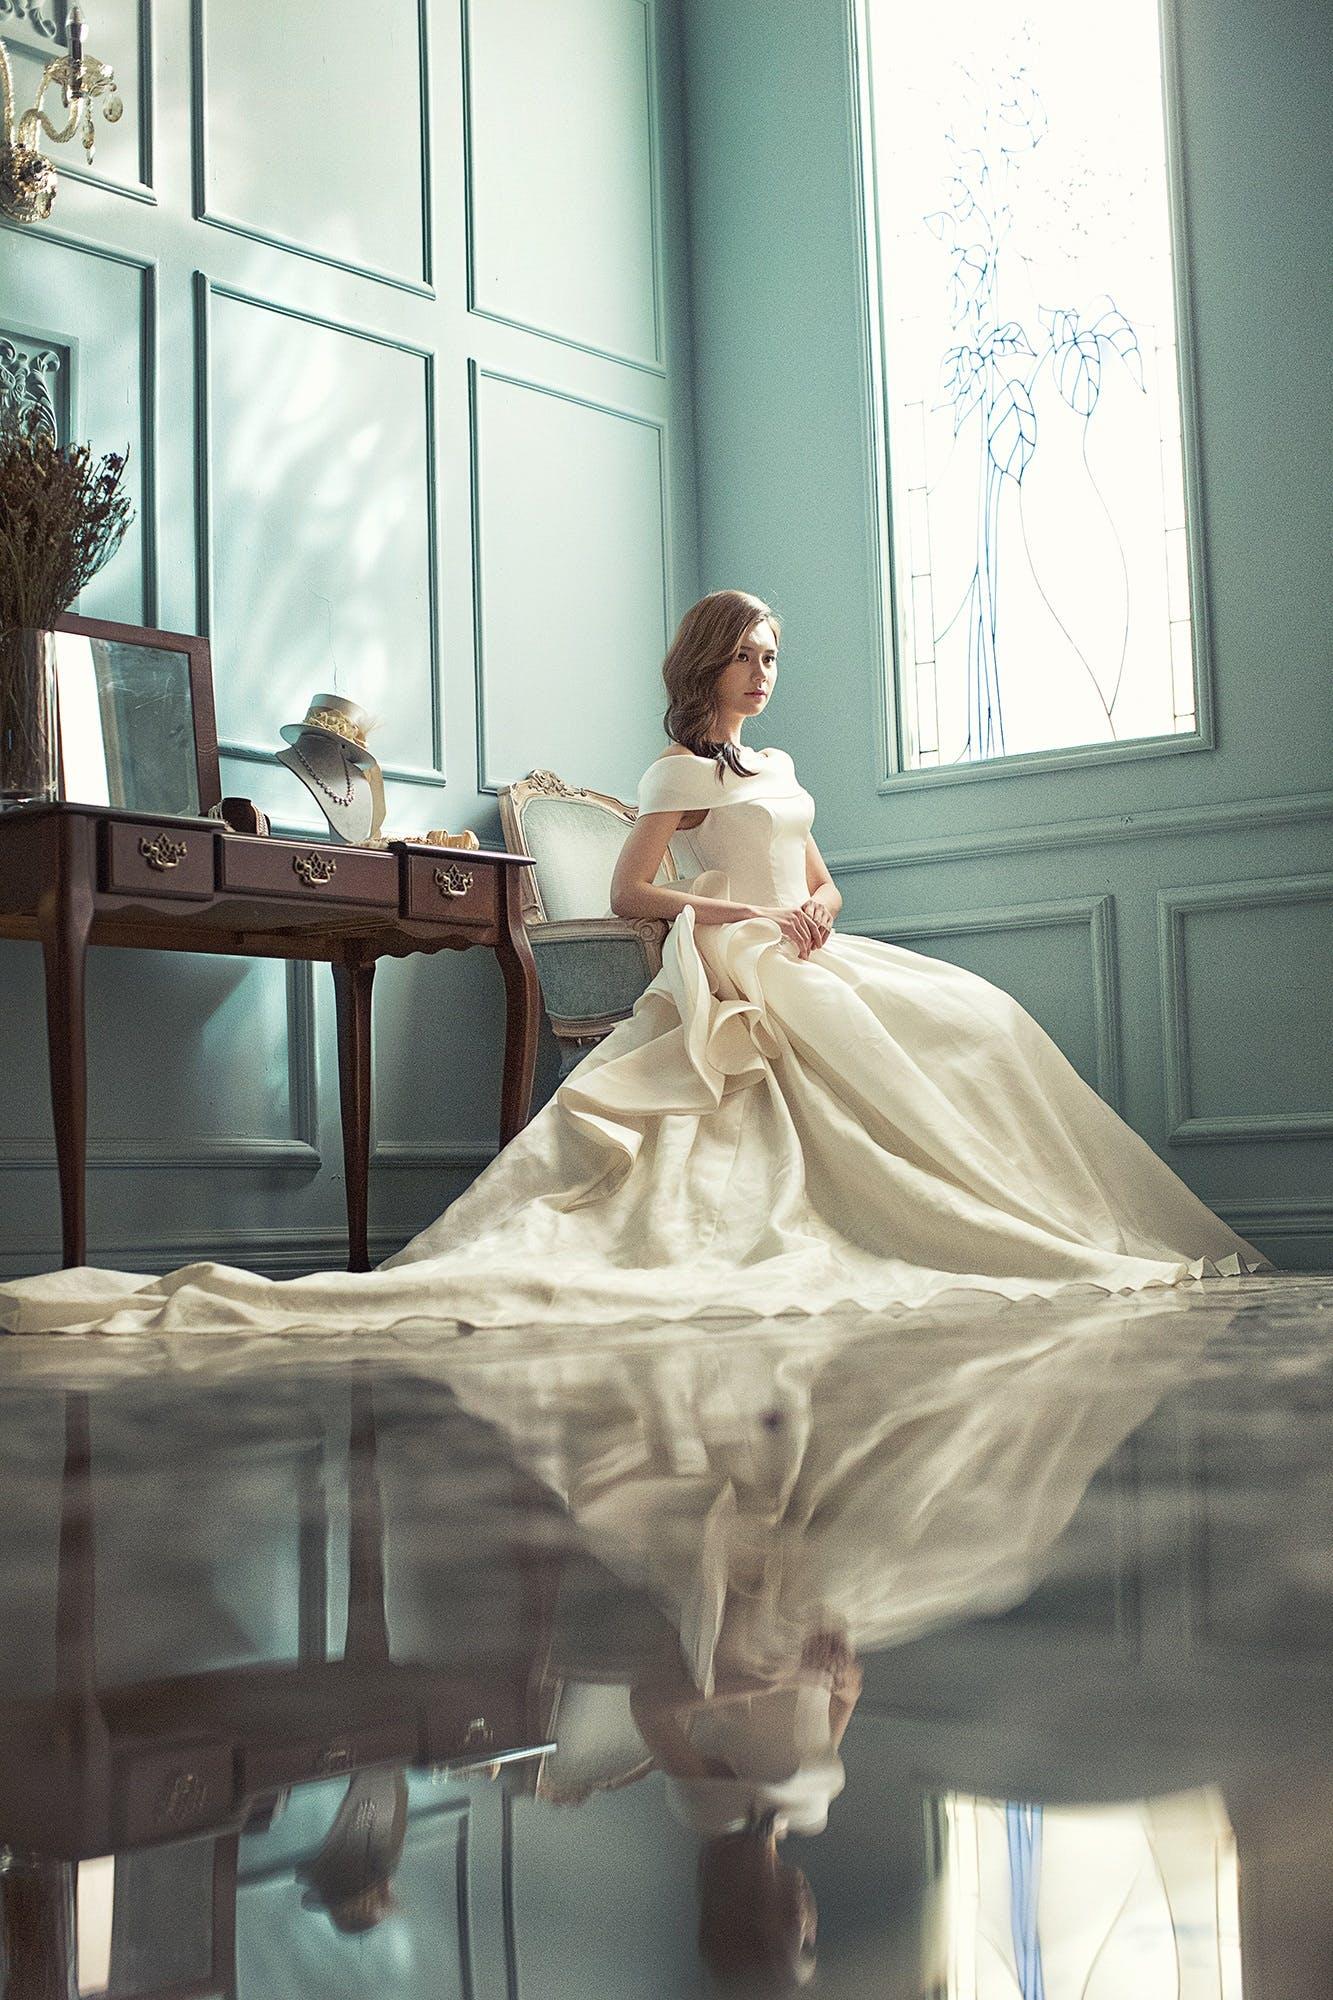 Free stock photo of fashion, bride, white dress, young woman